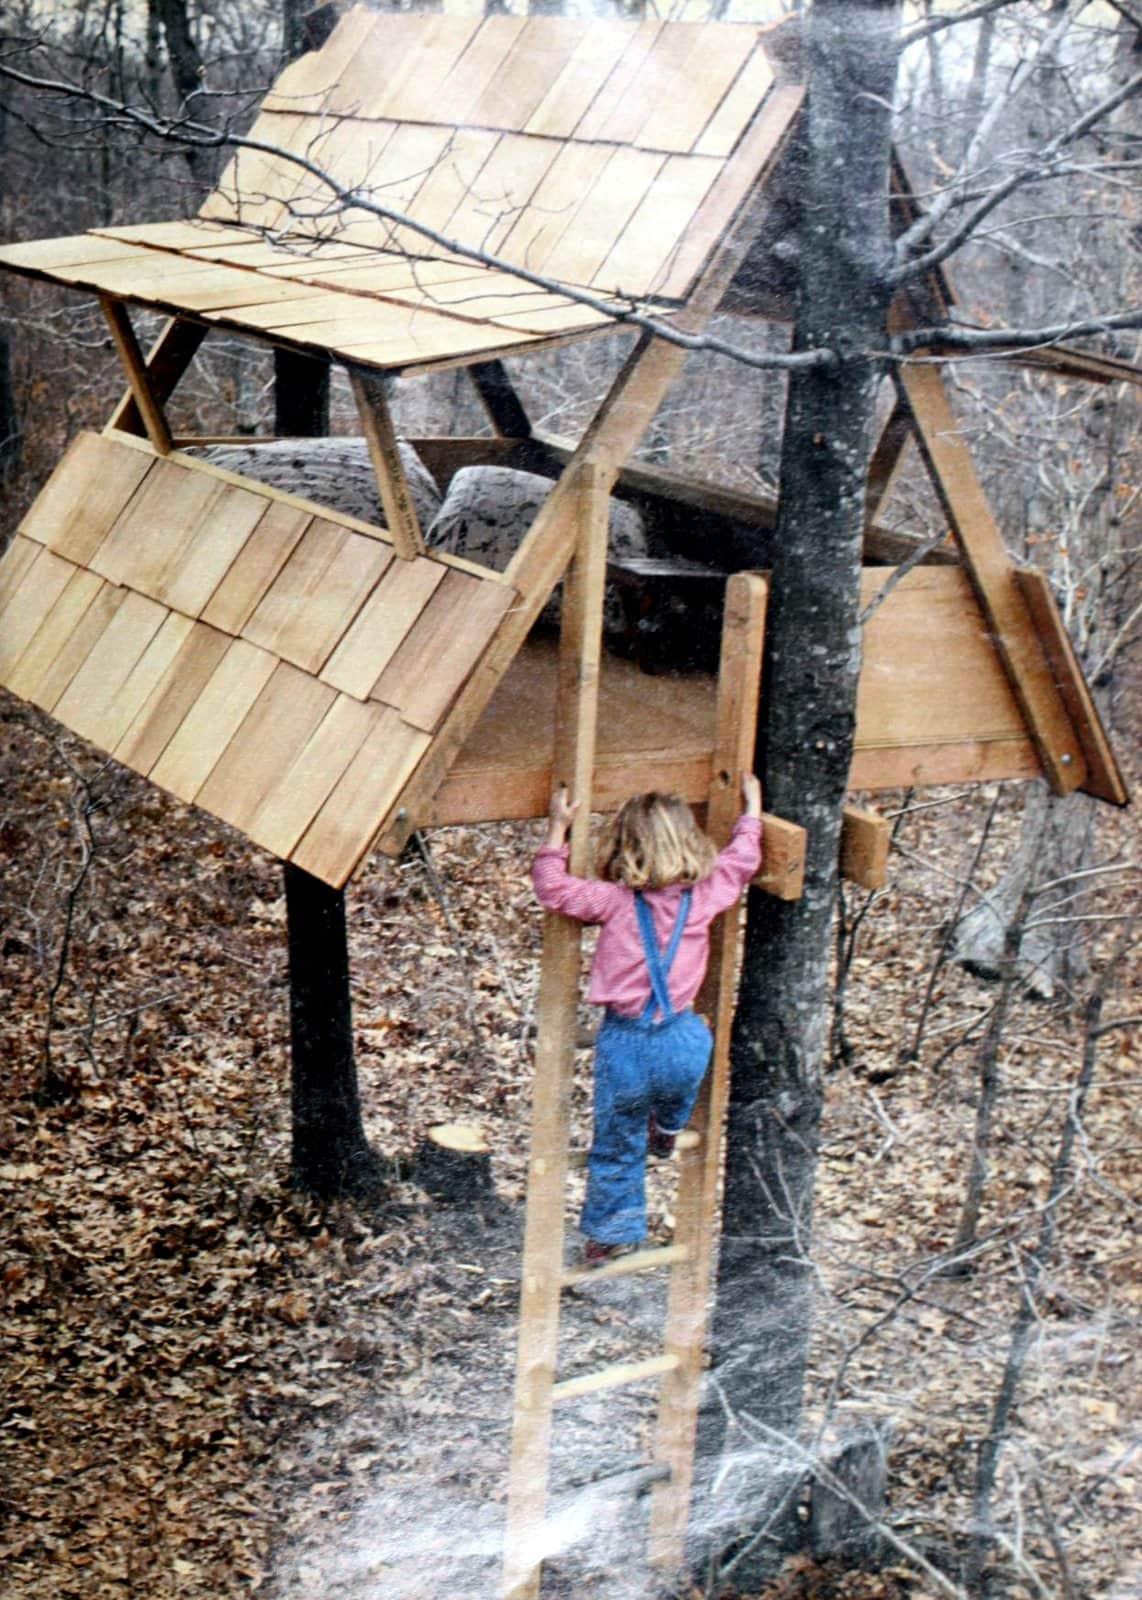 Vintage A-frame tree house (1978)